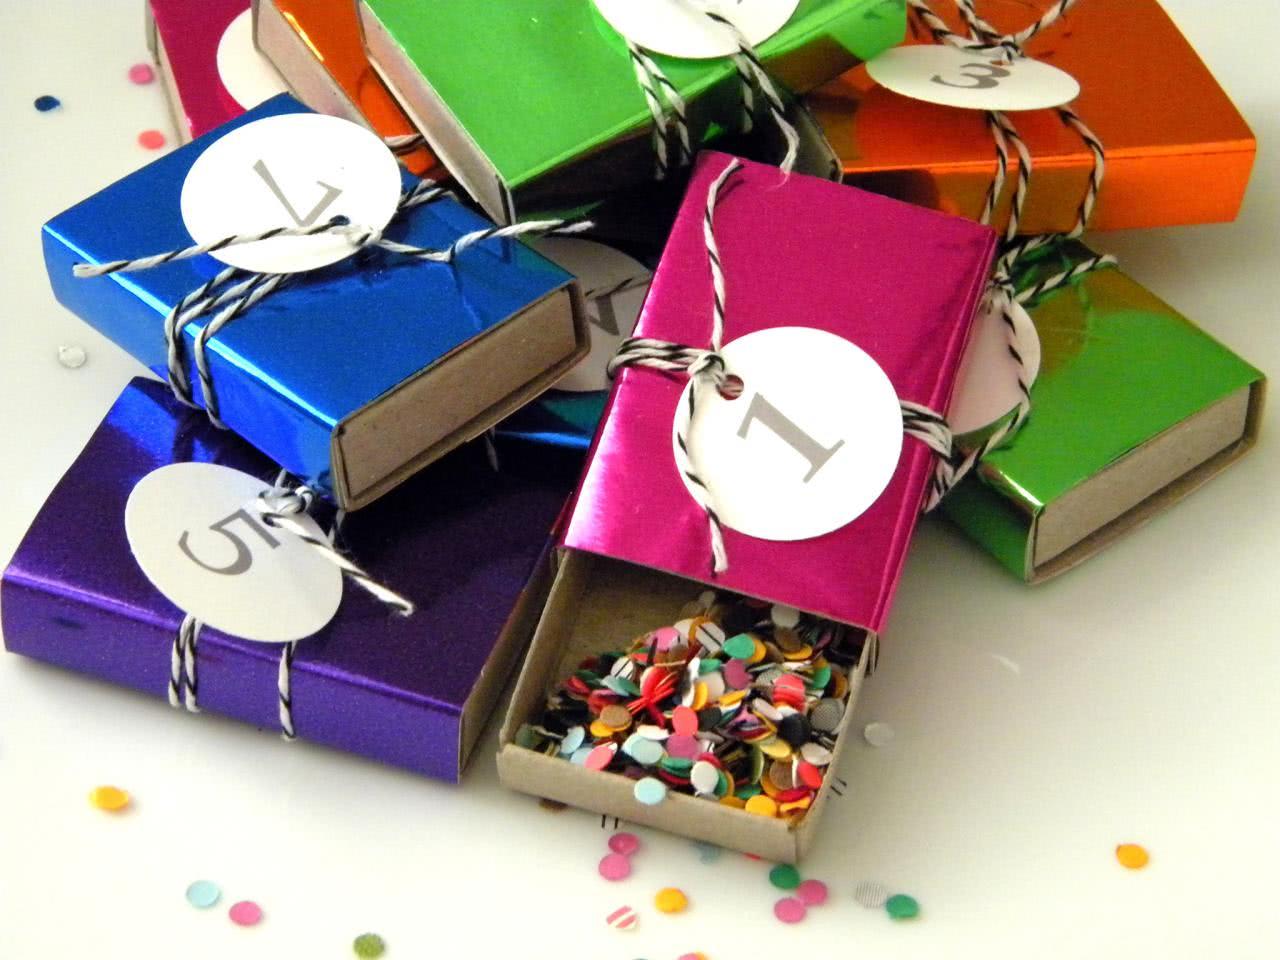 Confetes para a festa de Reveillon